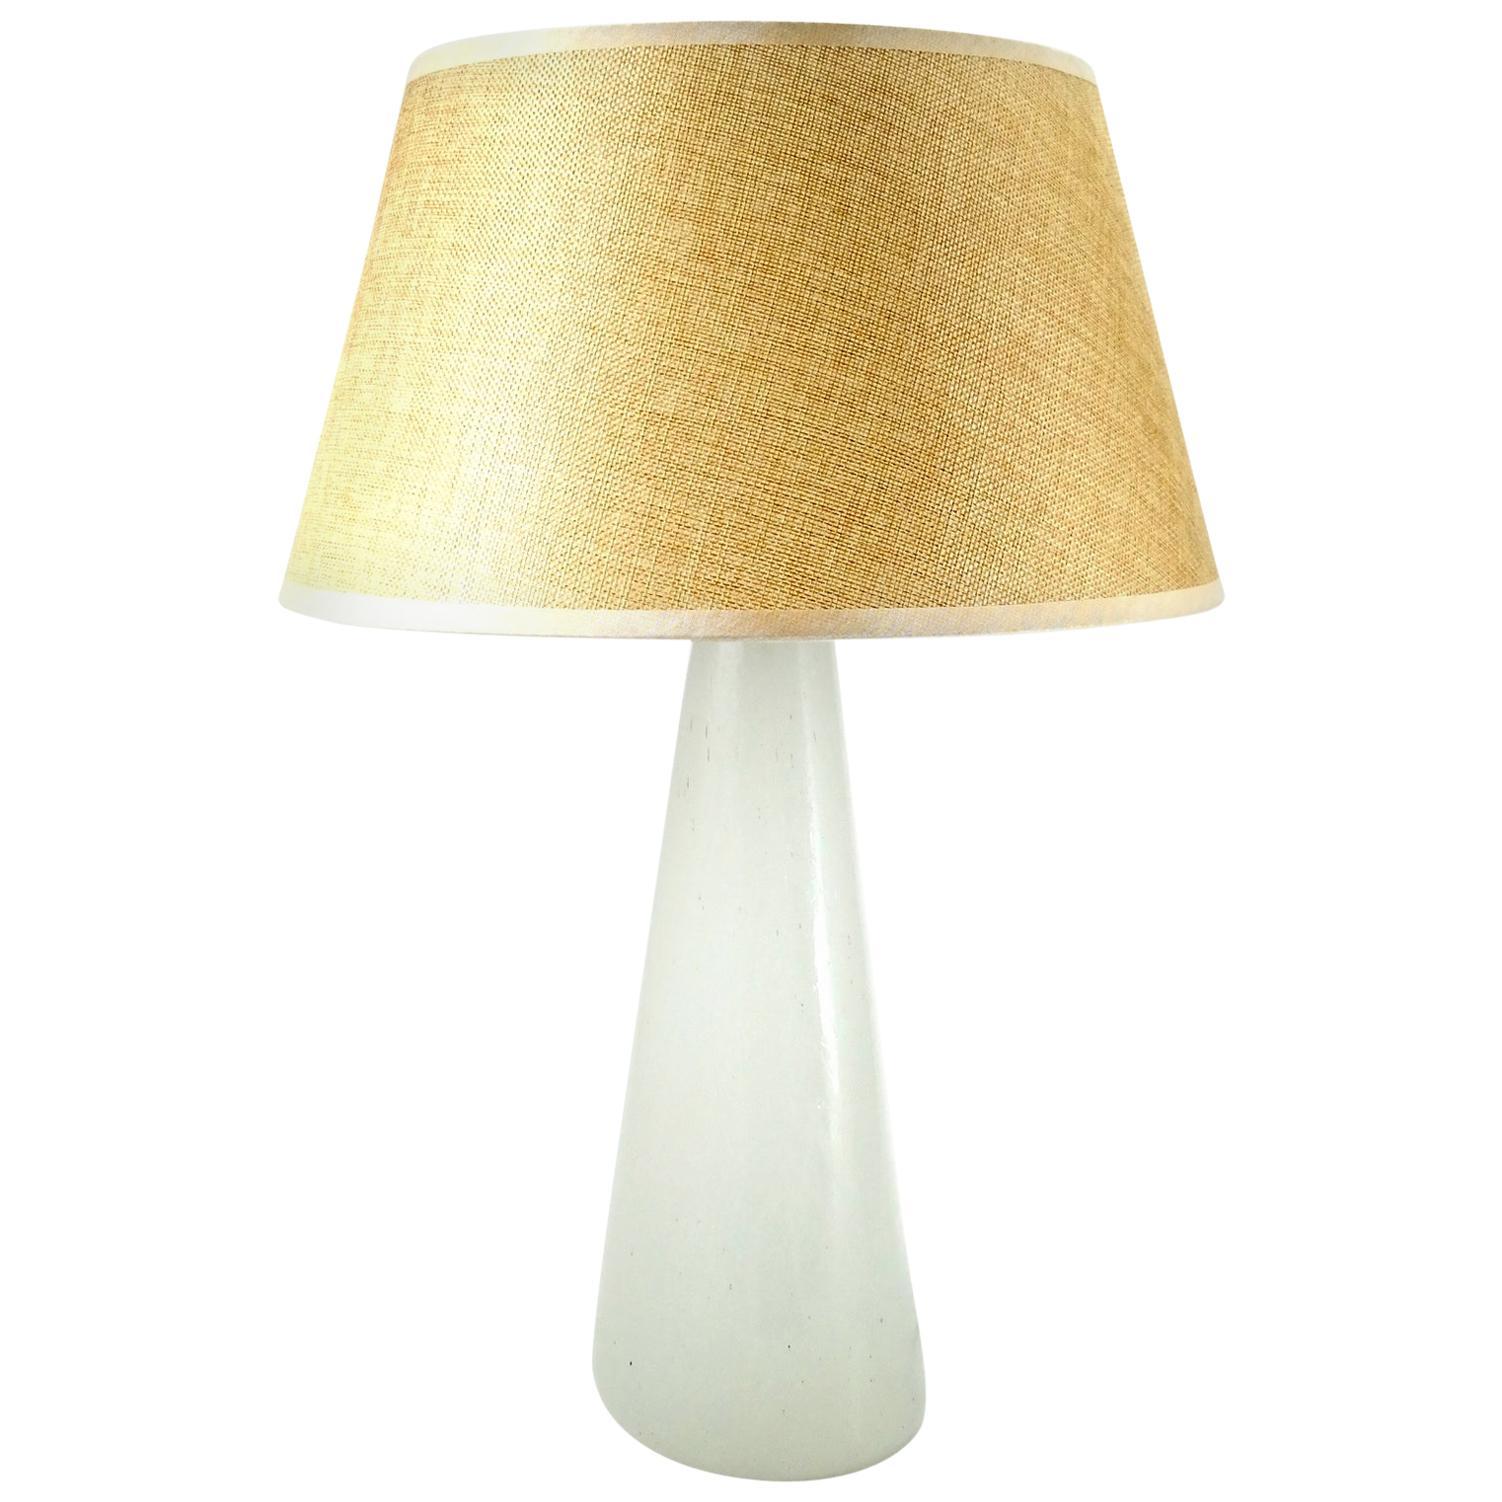 Murano Opaline Glass Table Lamp, 1970s